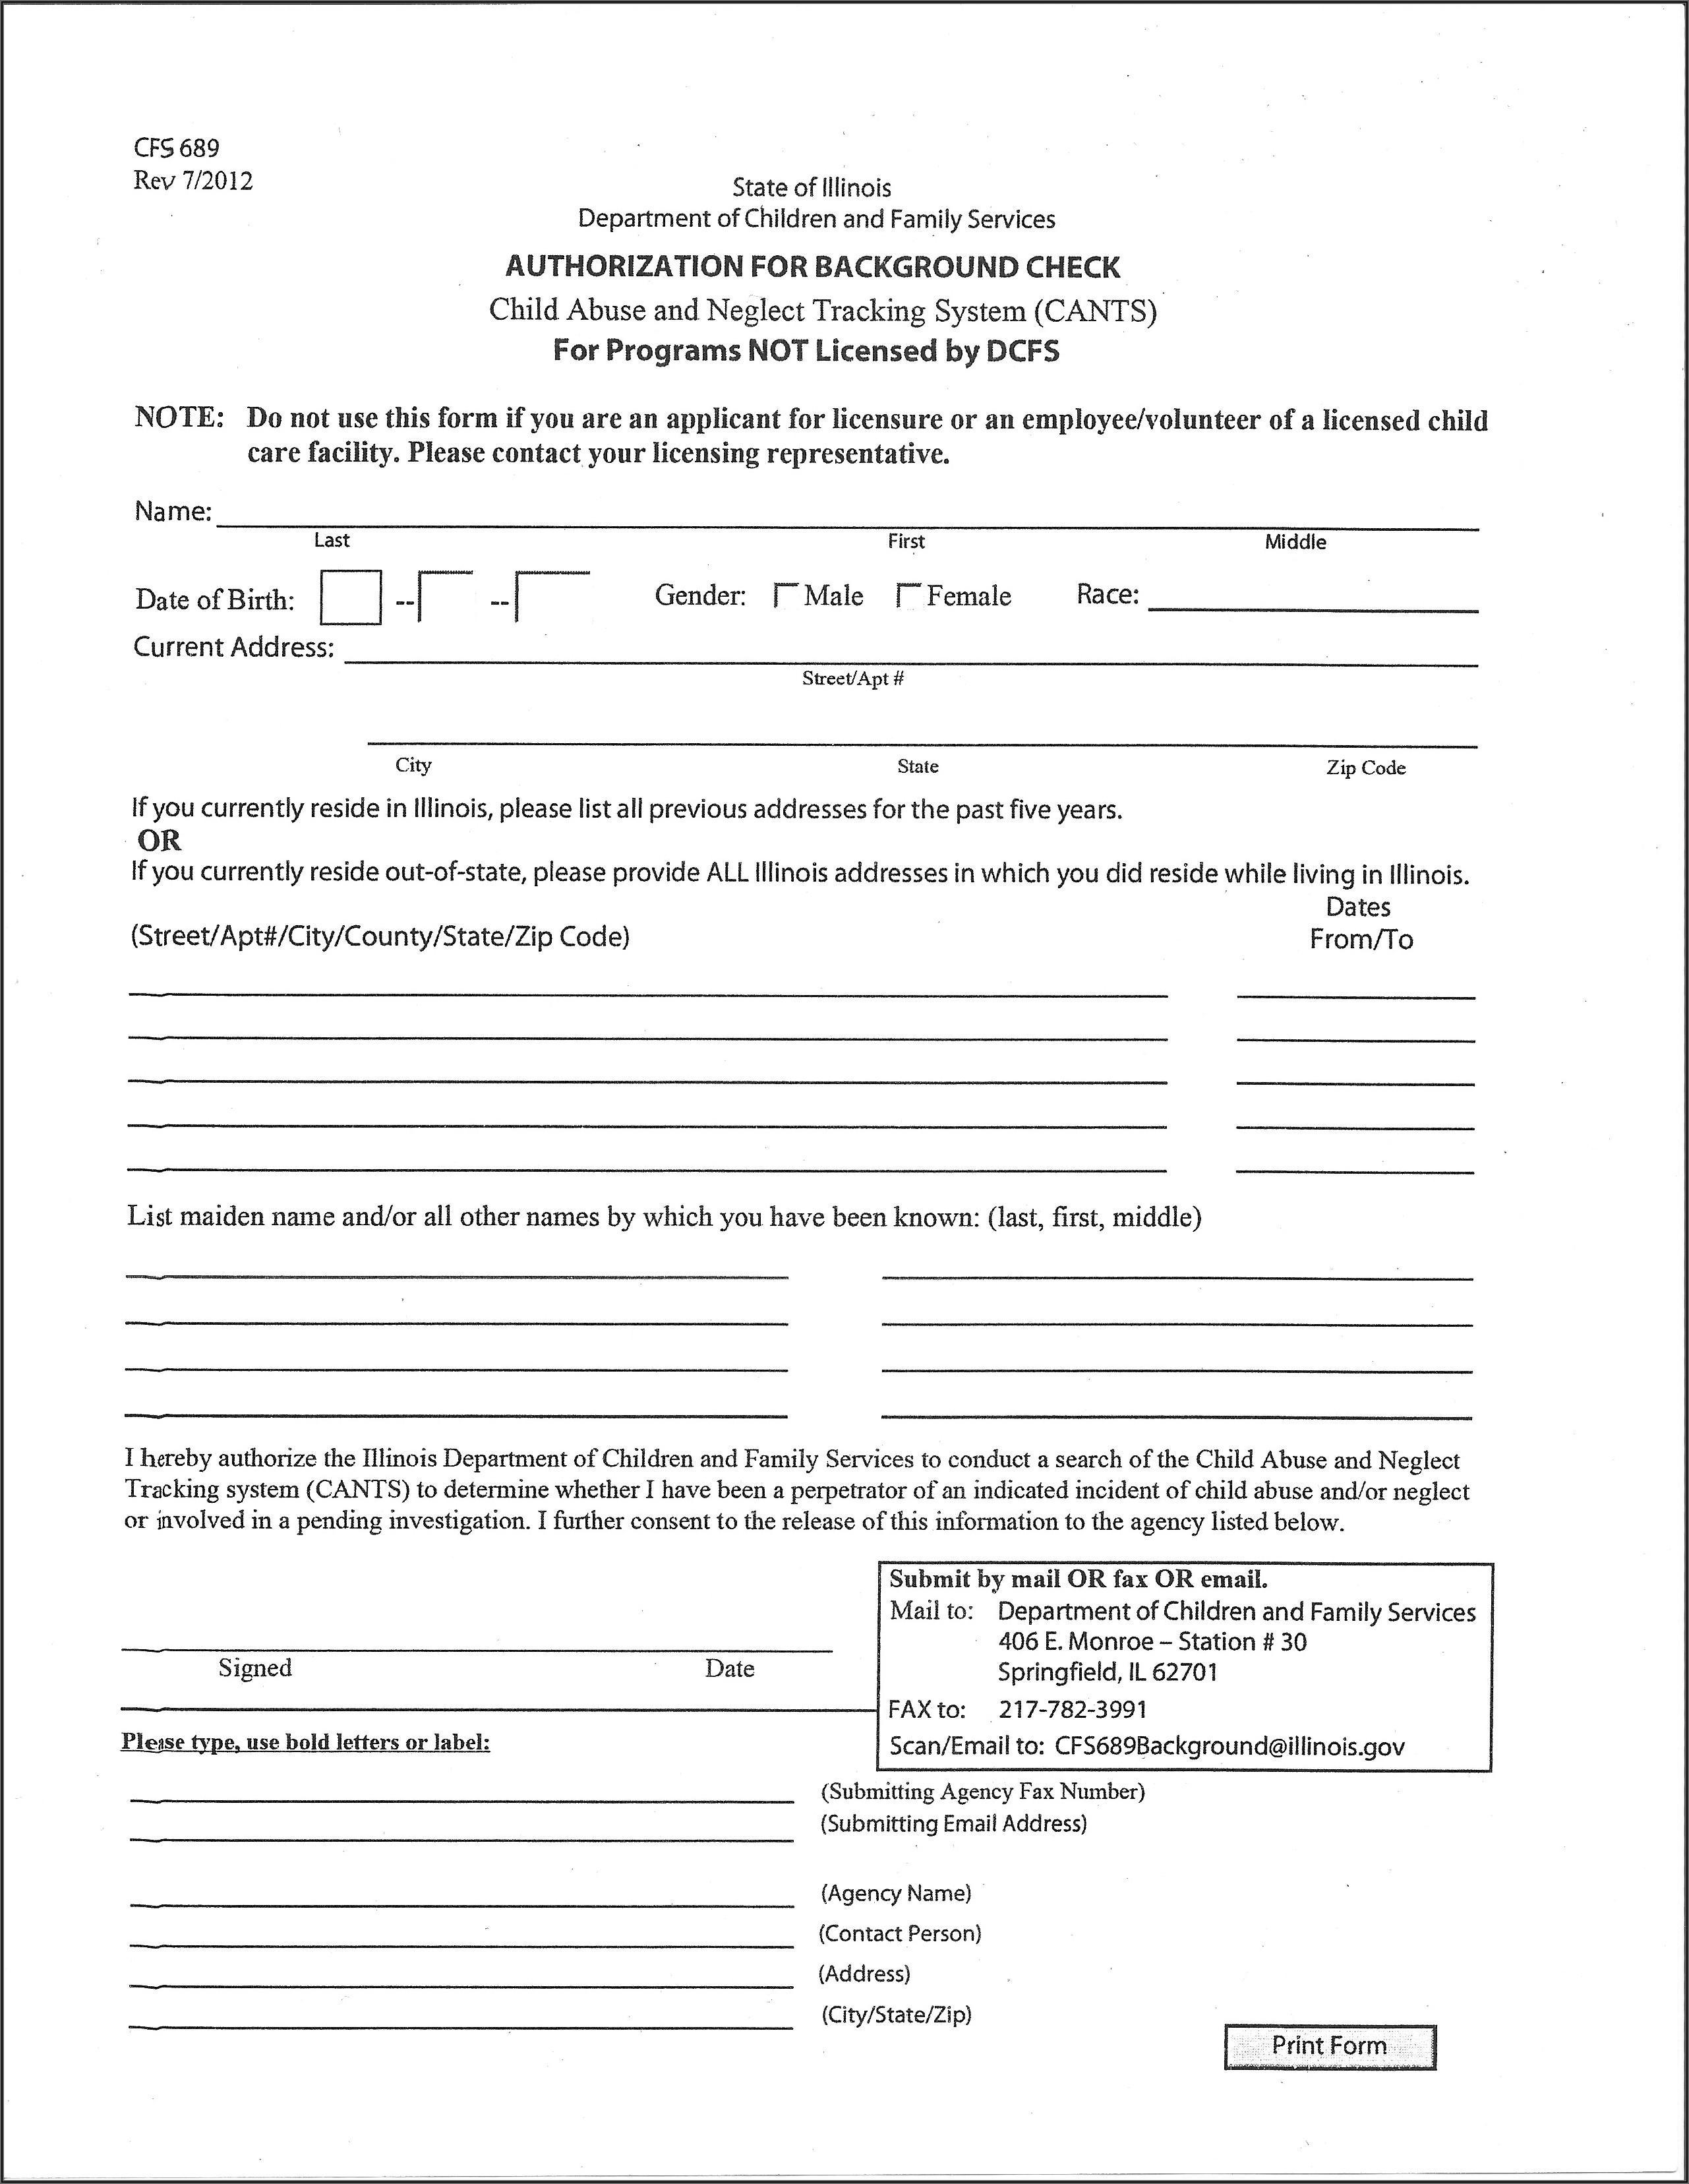 Criminal Background Check Authorization Form Illinois